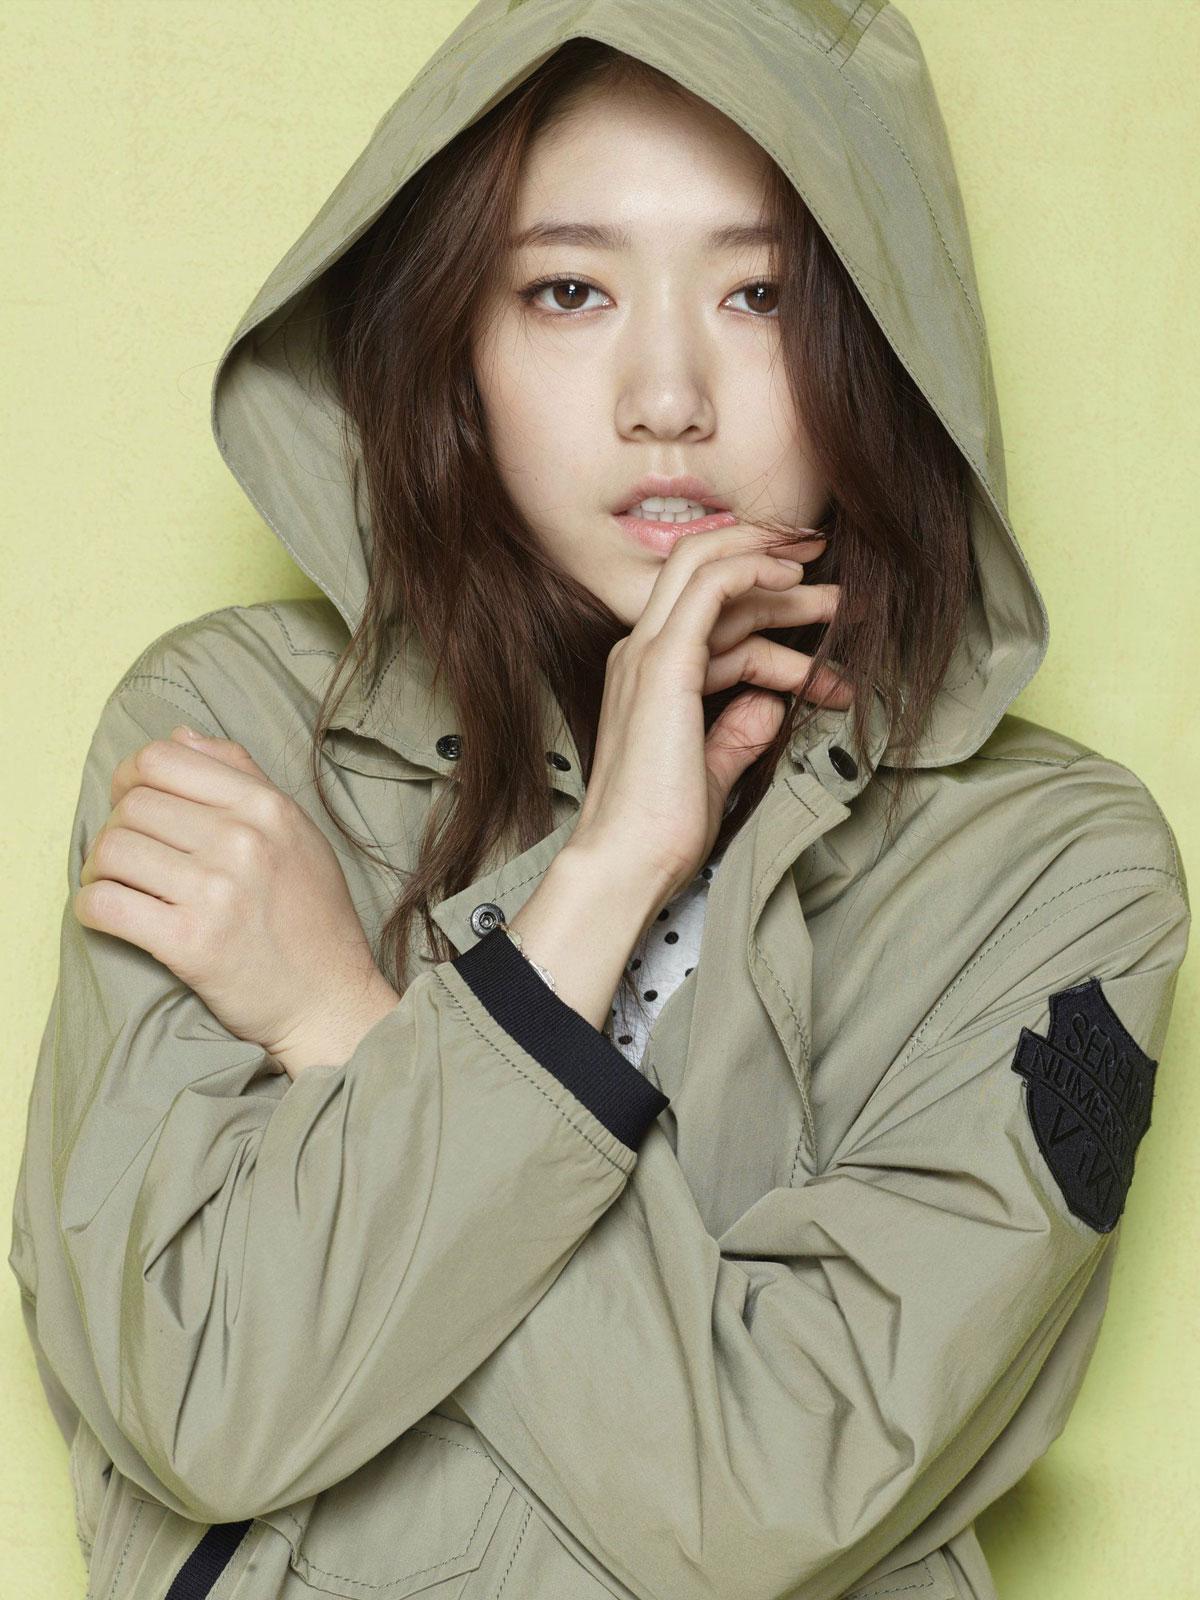 Park Shin Hye Viki clothing advertisement